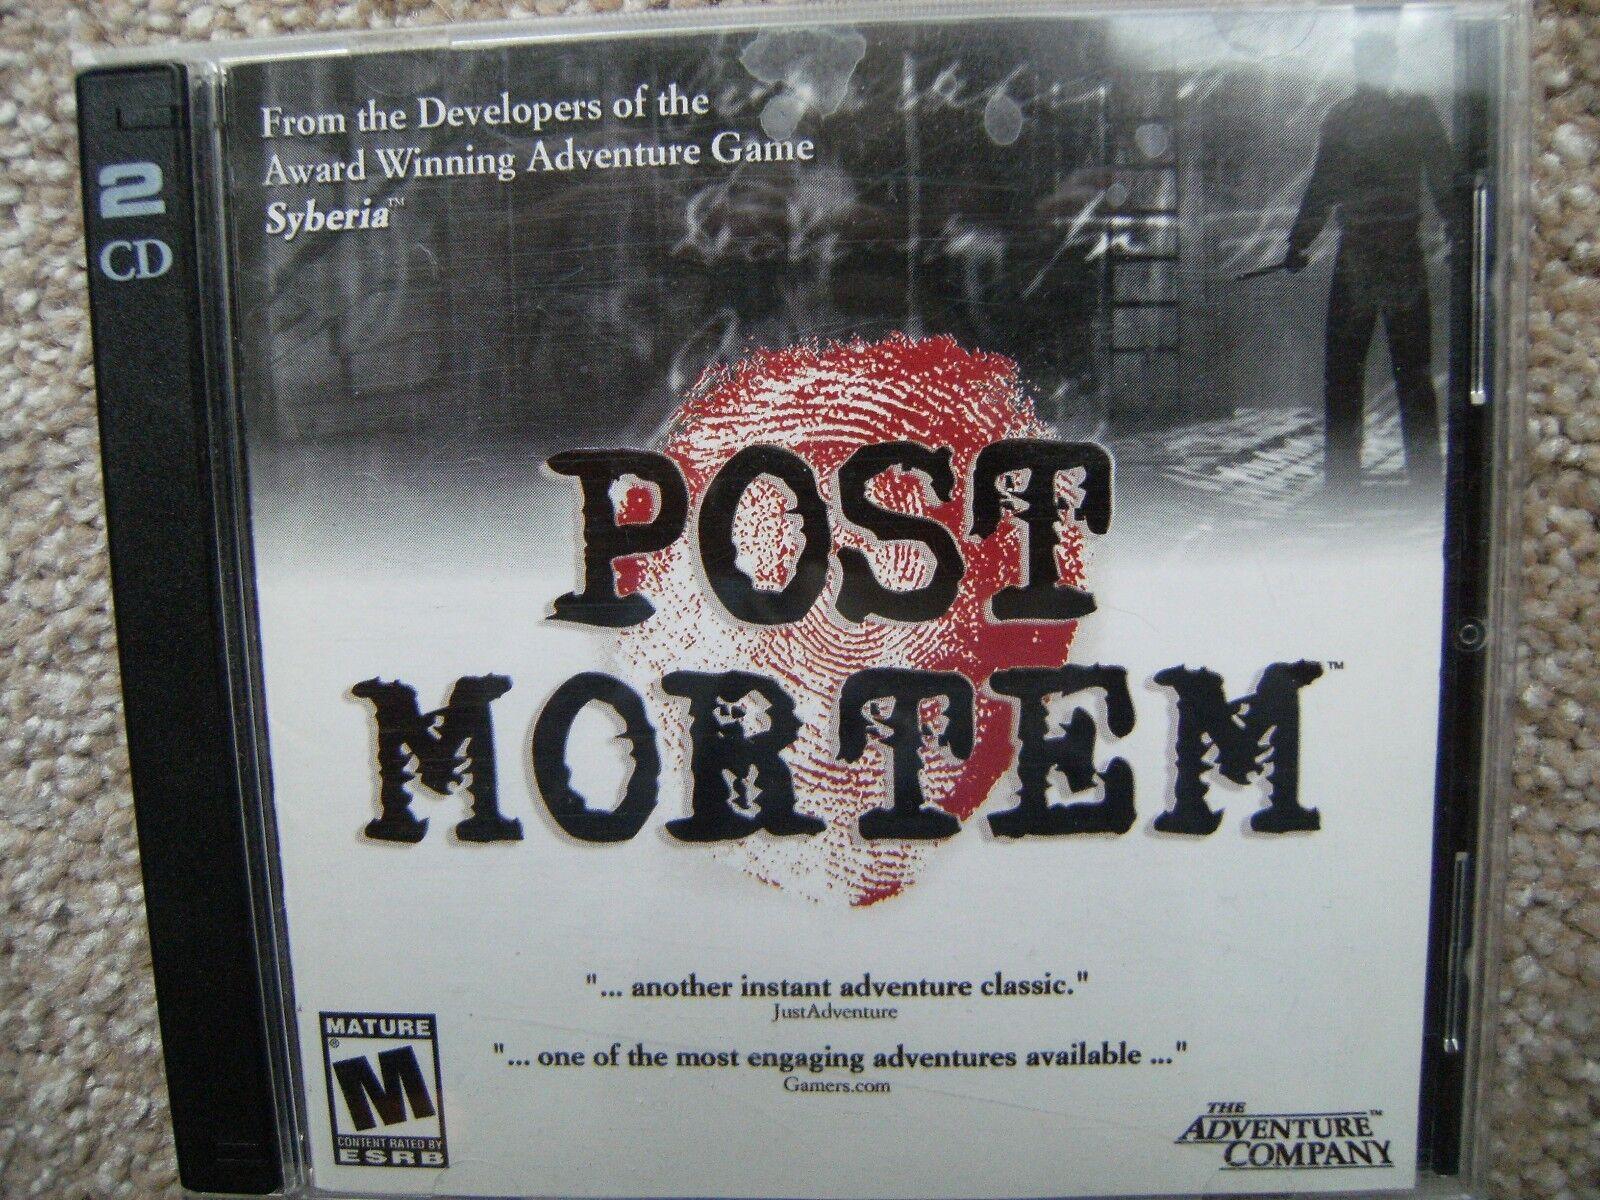 Computer Games - Post Mortem PC Computer Game 2003 Windows  2 Discs + Manual in Jewel Case